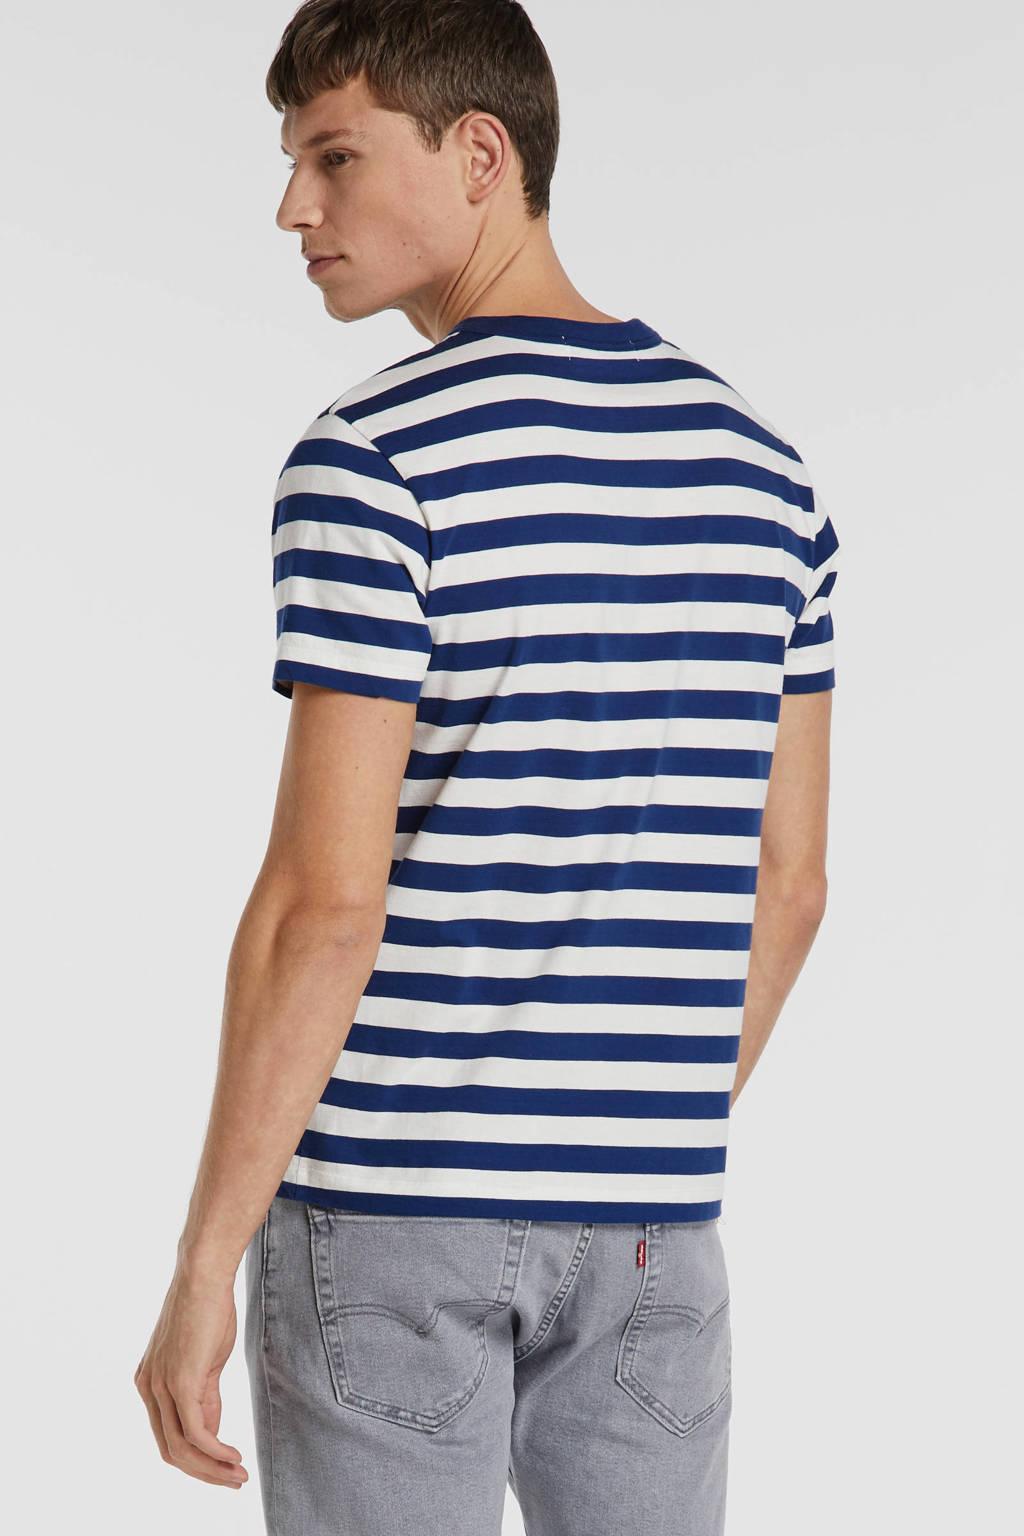 Kings of Indigo gestreept T-shirt blauw/wit, Blauw/wit